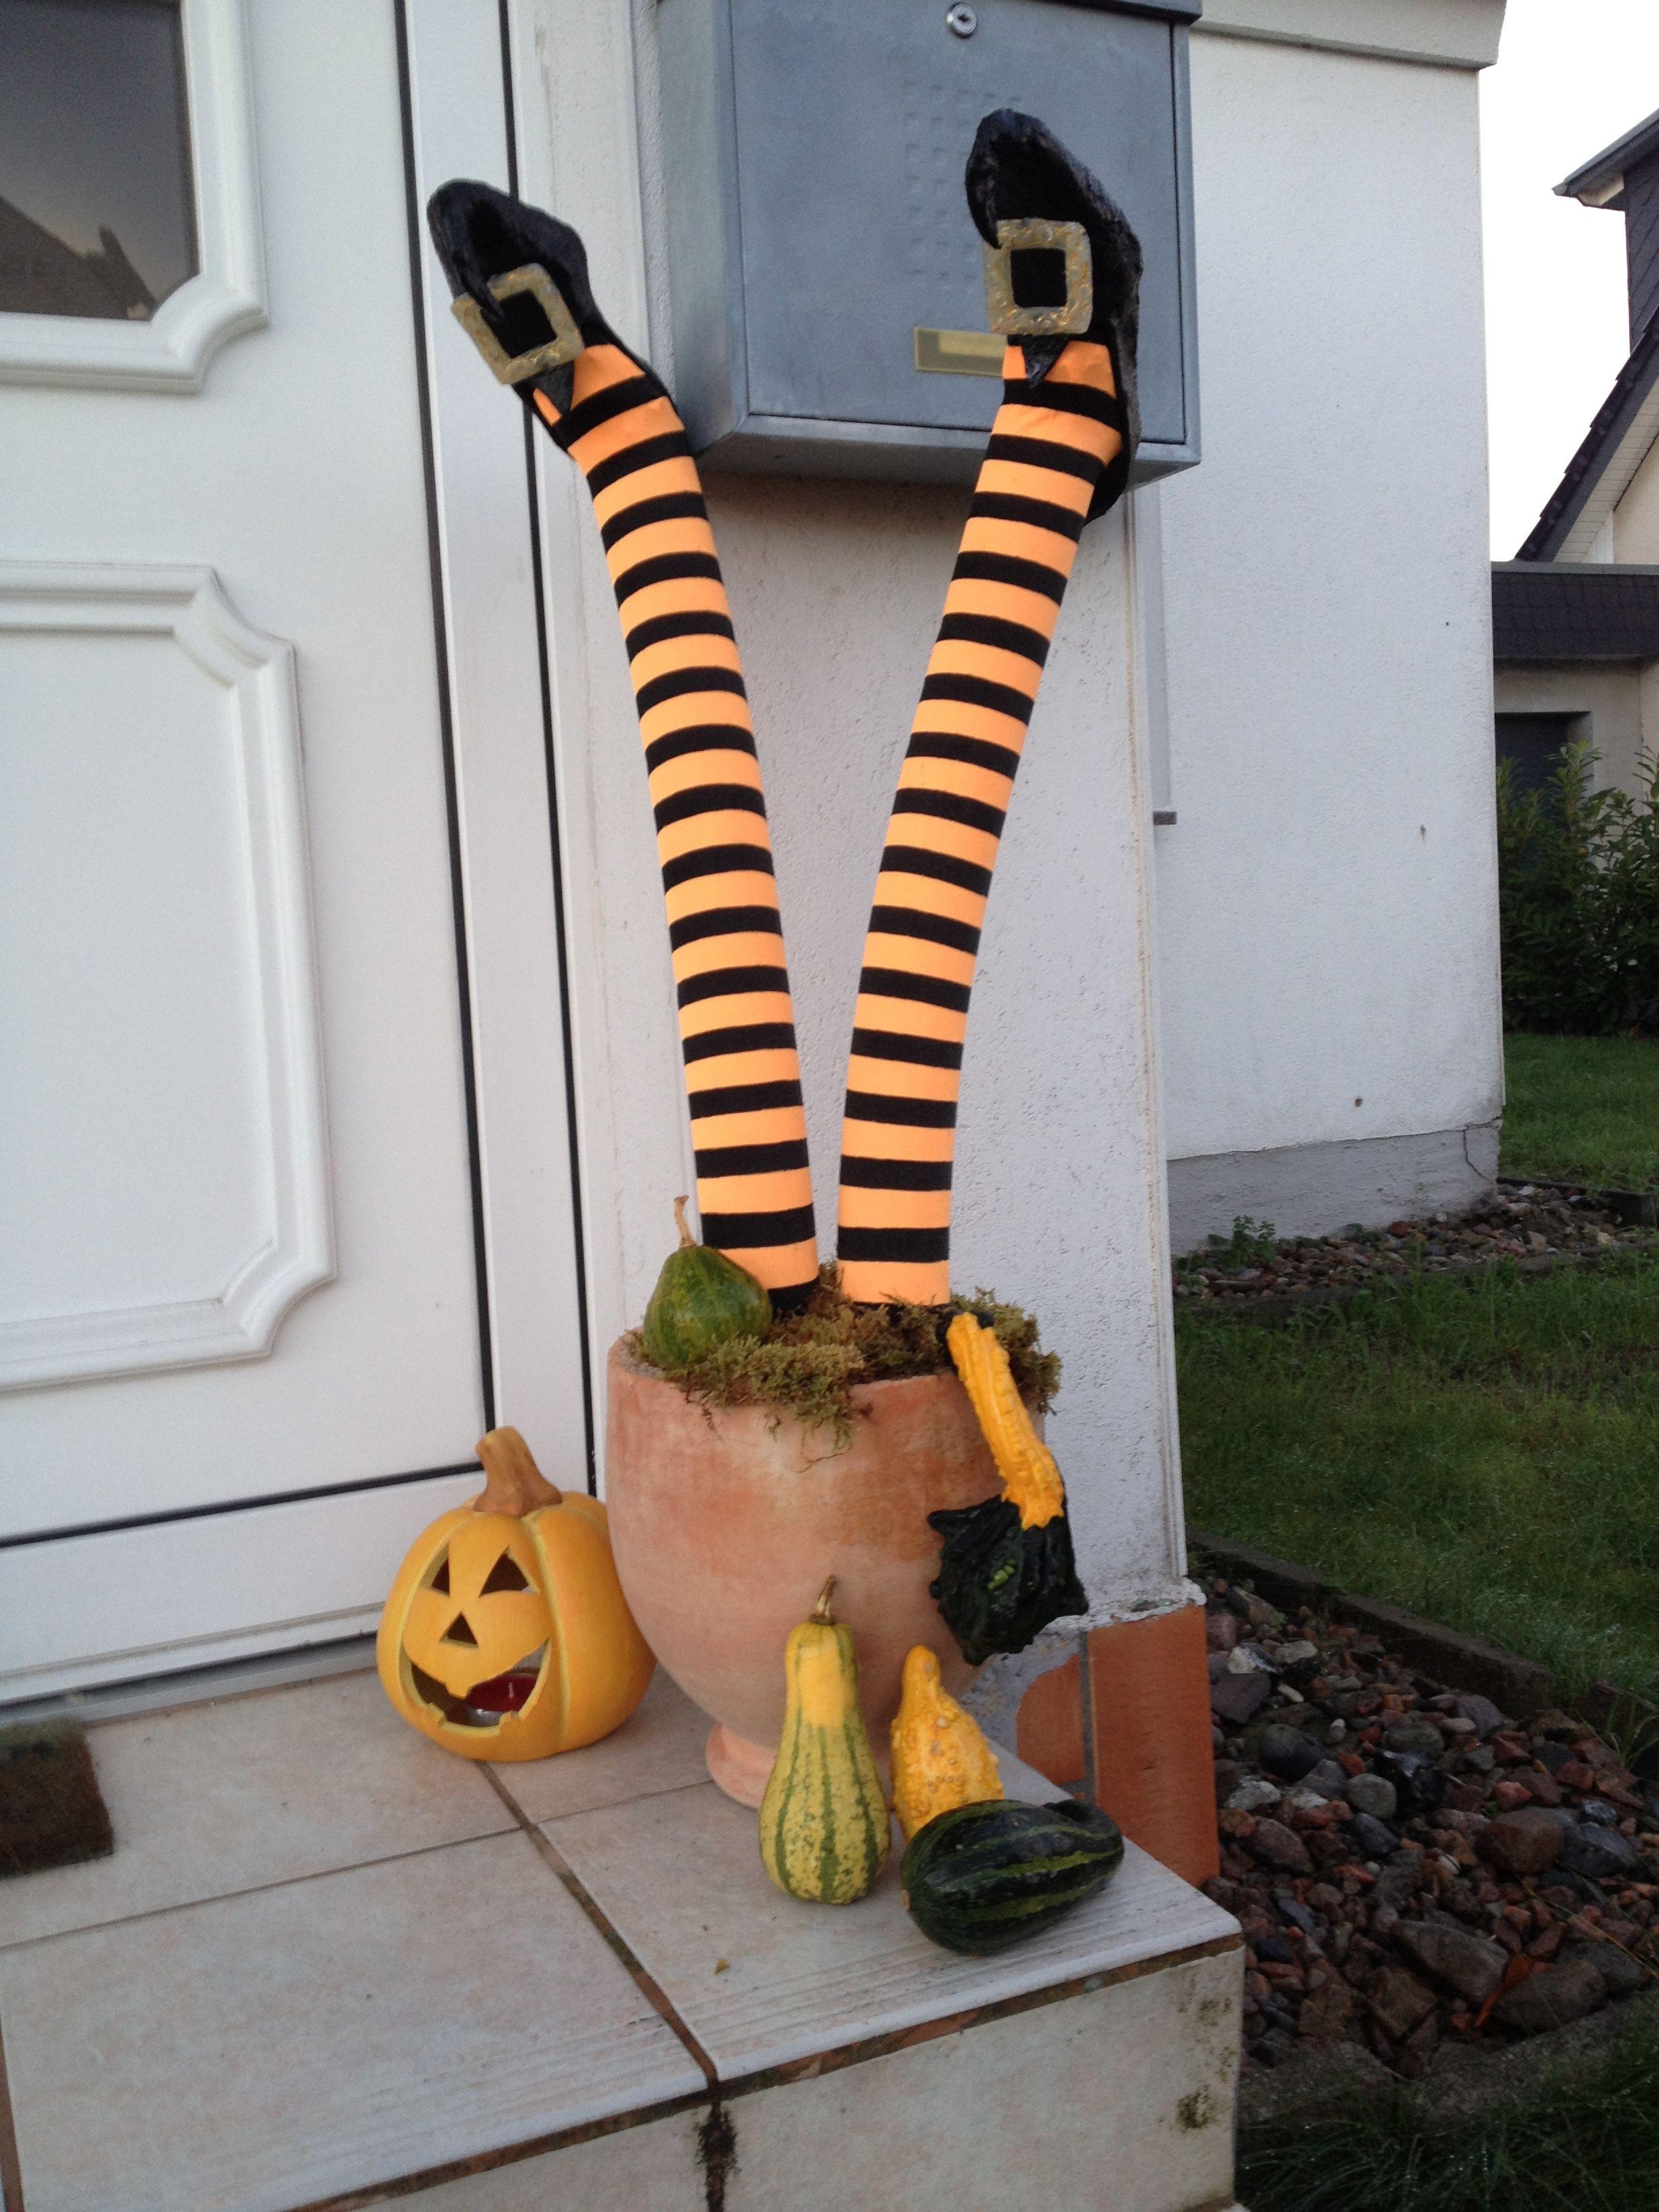 Halloween Deko Aus Poolnudel Halloween Deko Garten Halloween Deko Halloween Deko Basteln